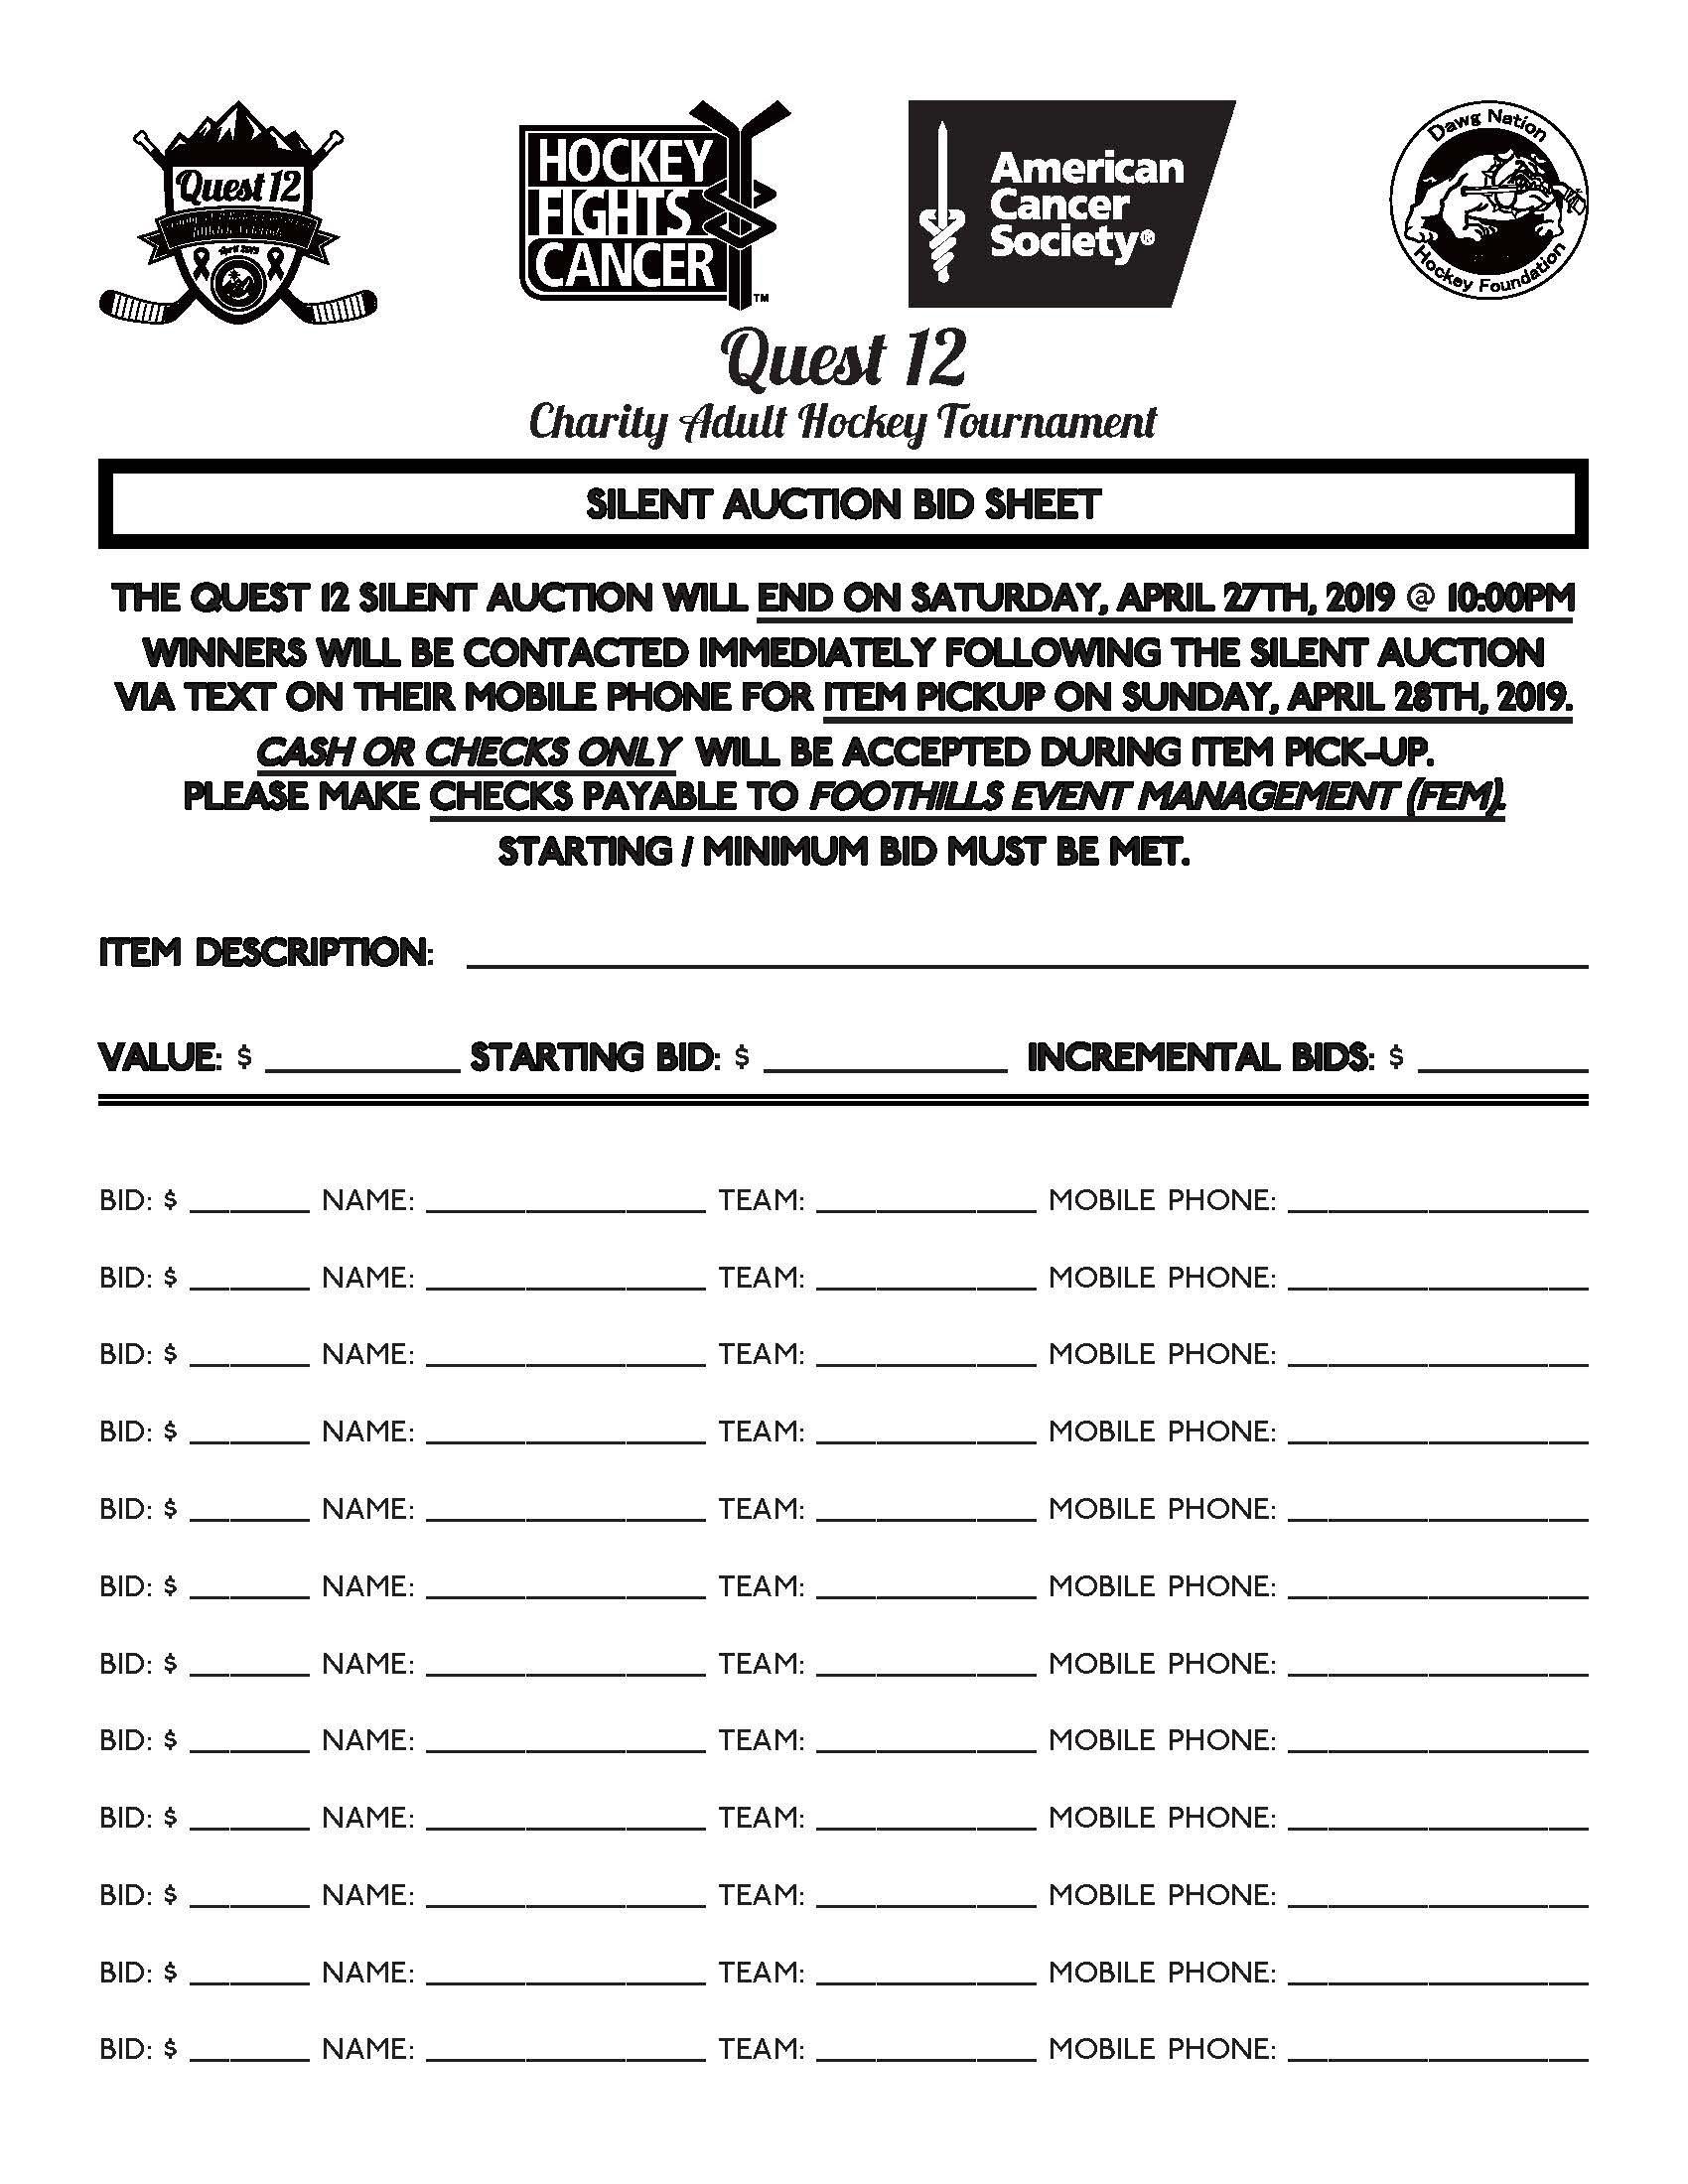 Quest 12 Silent Auction Bid Sheet